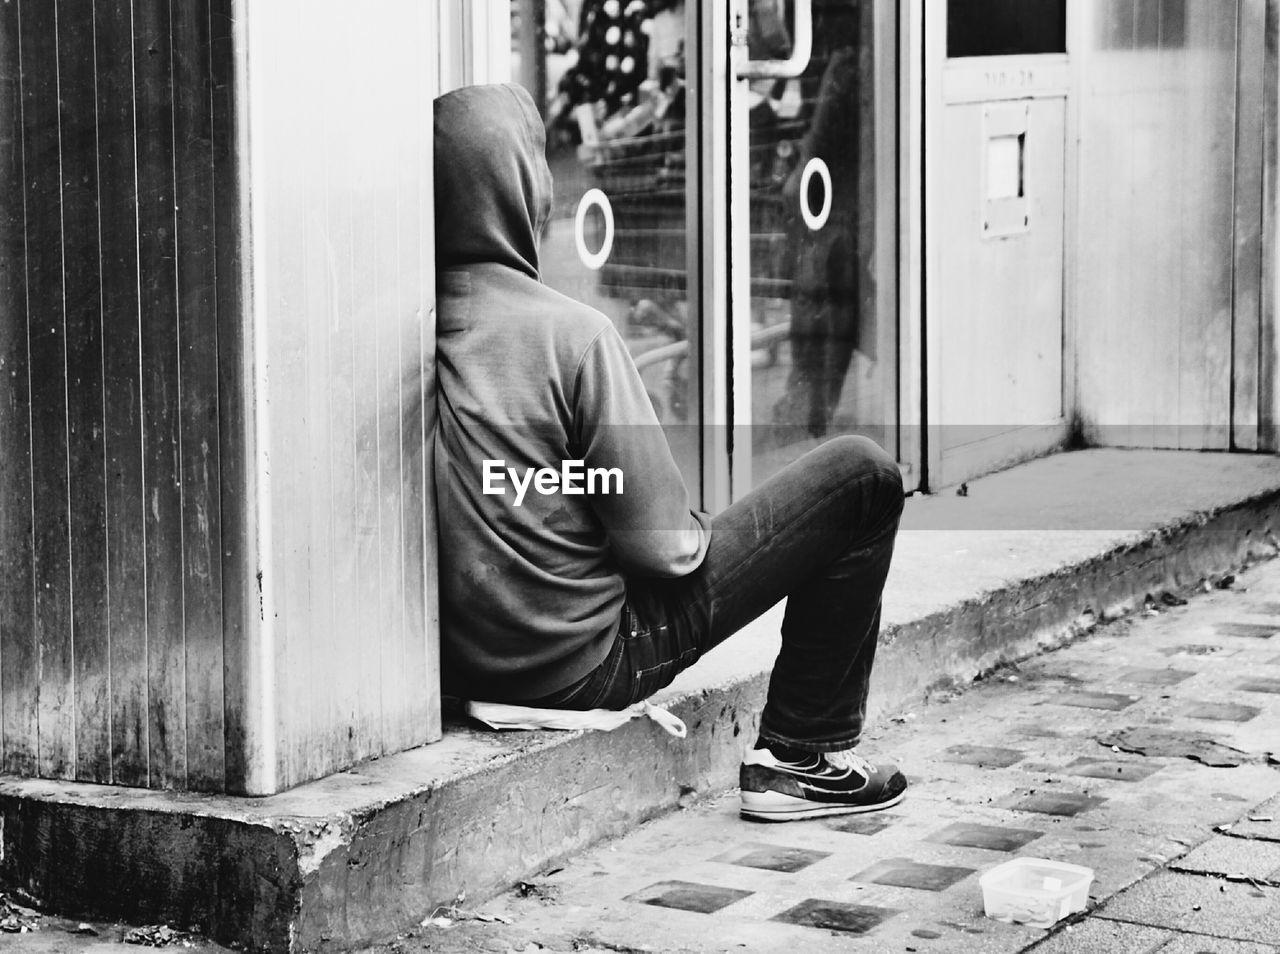 Man Wearing Hooded Shirt Sitting Outside Shop